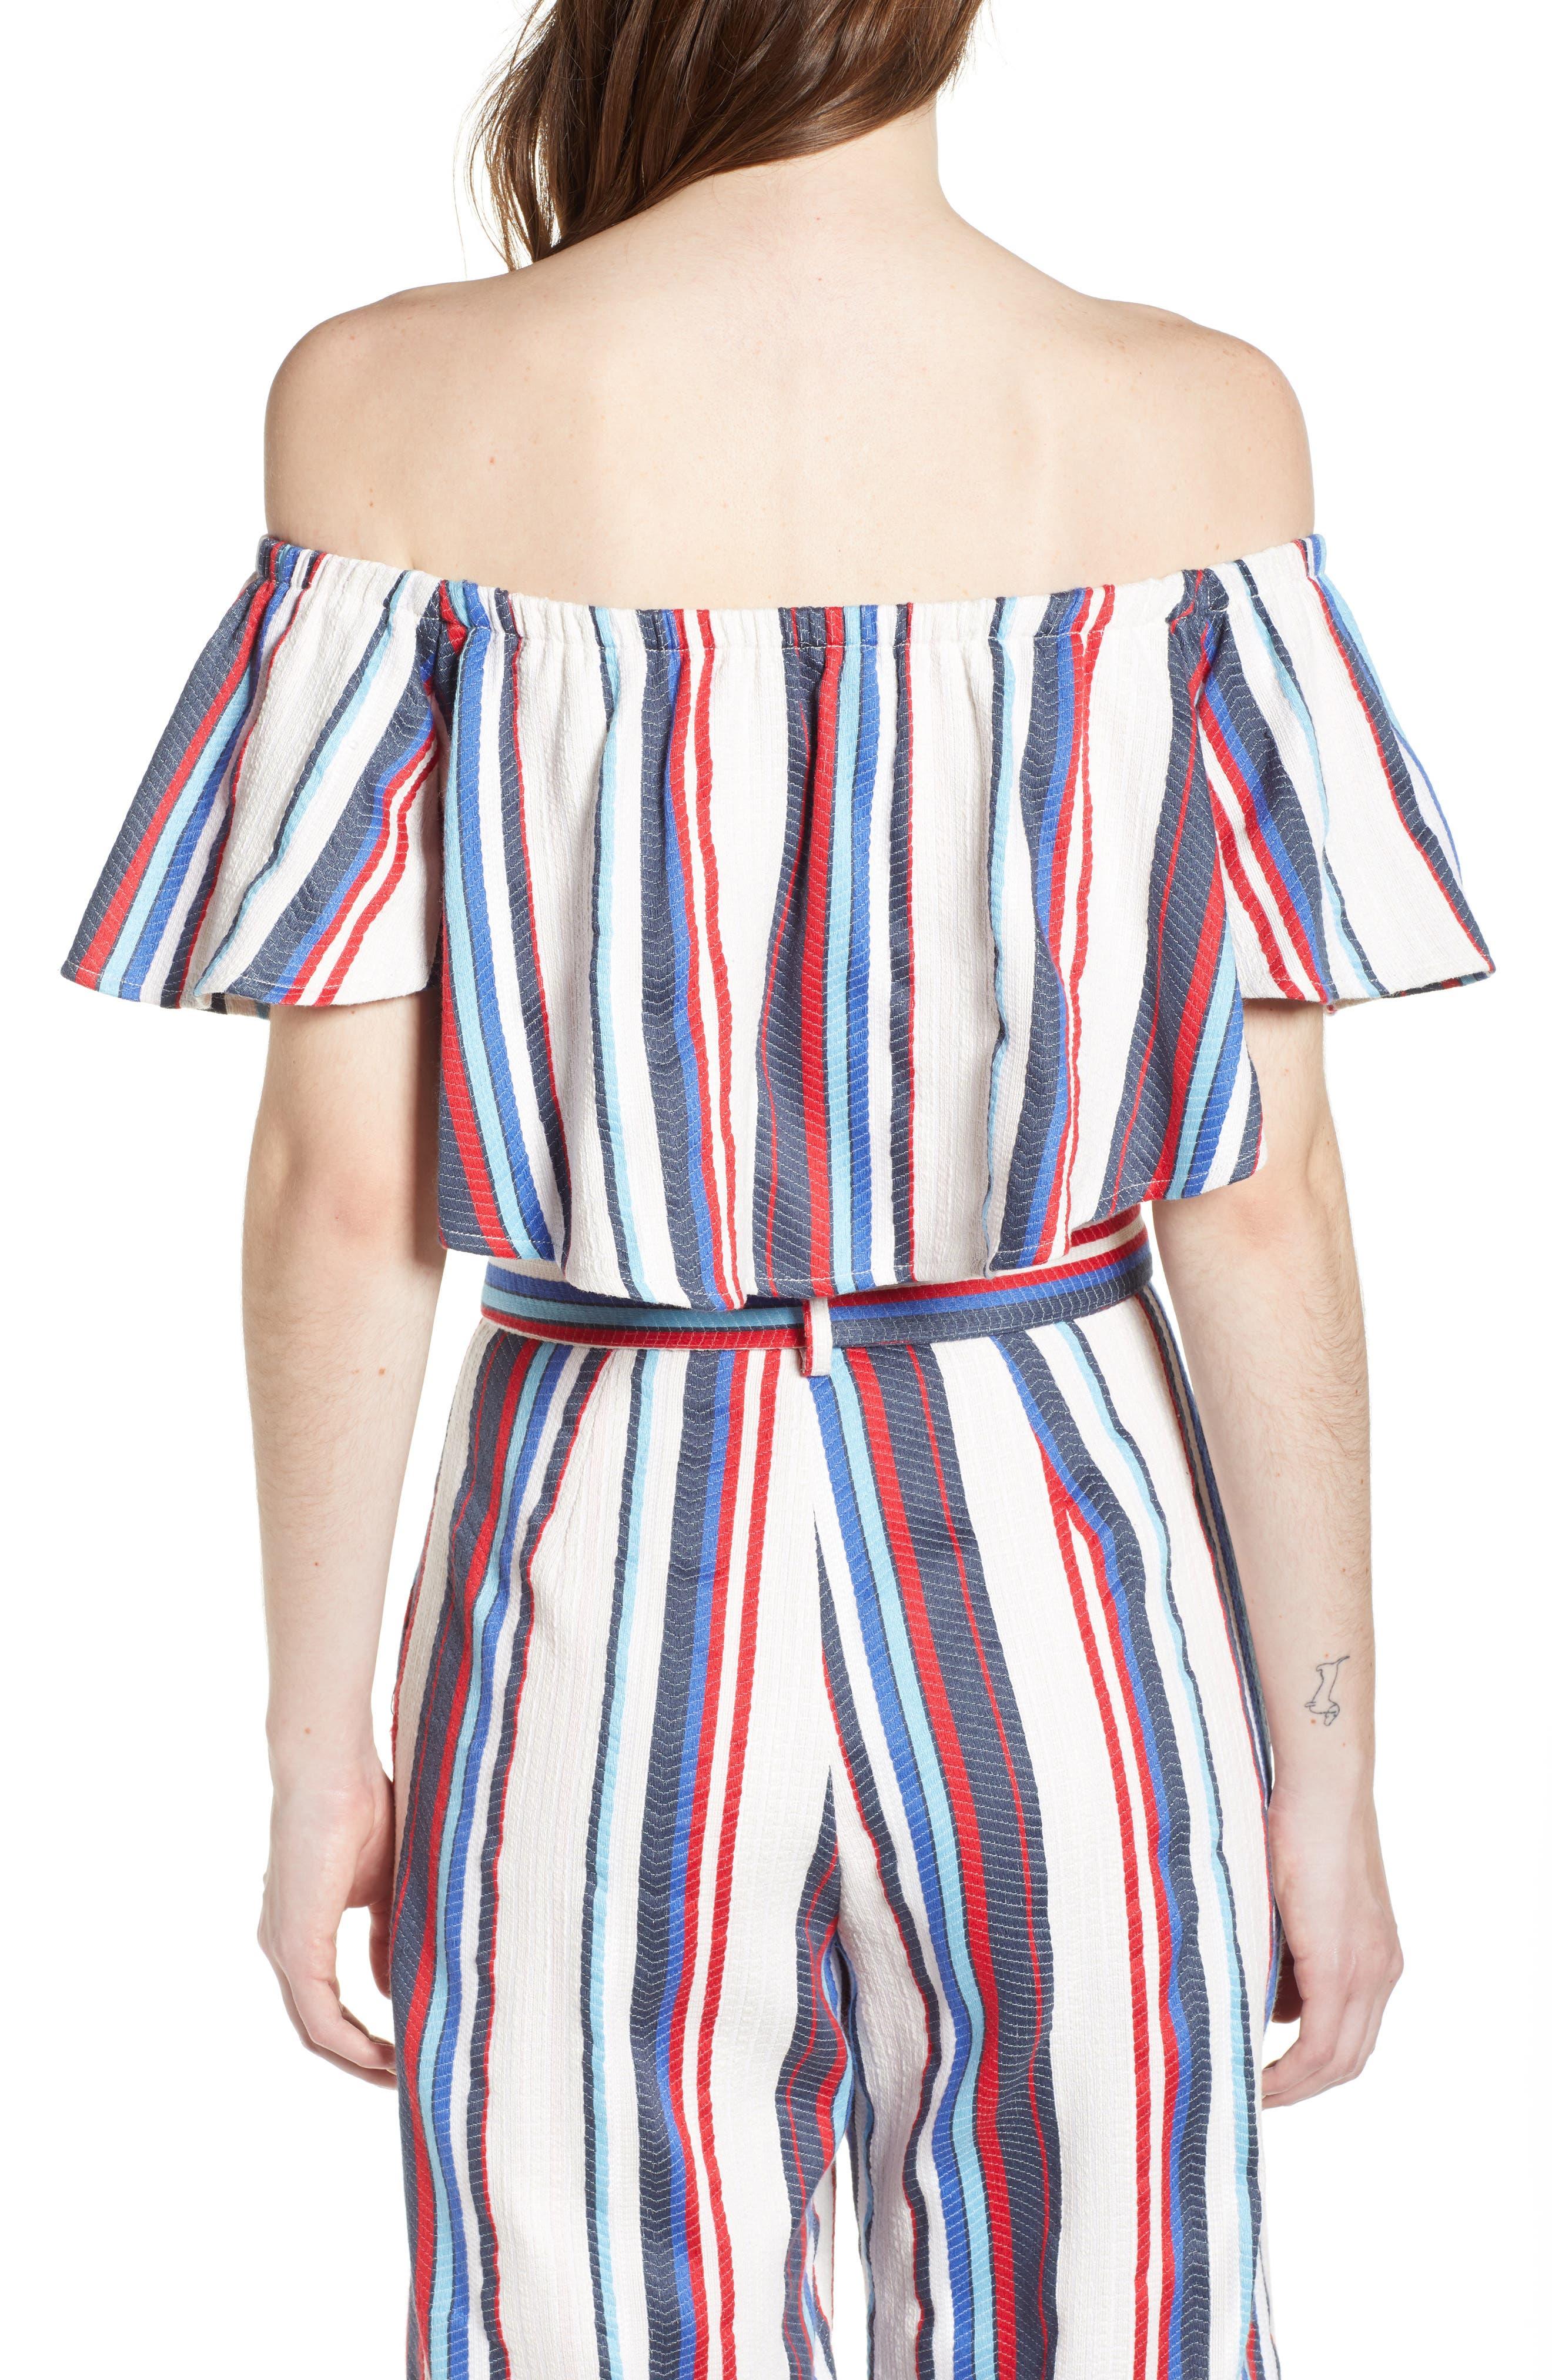 LOST + WANDER,                             Azul Stripe Off the Shoulder Crop Top,                             Alternate thumbnail 2, color,                             400